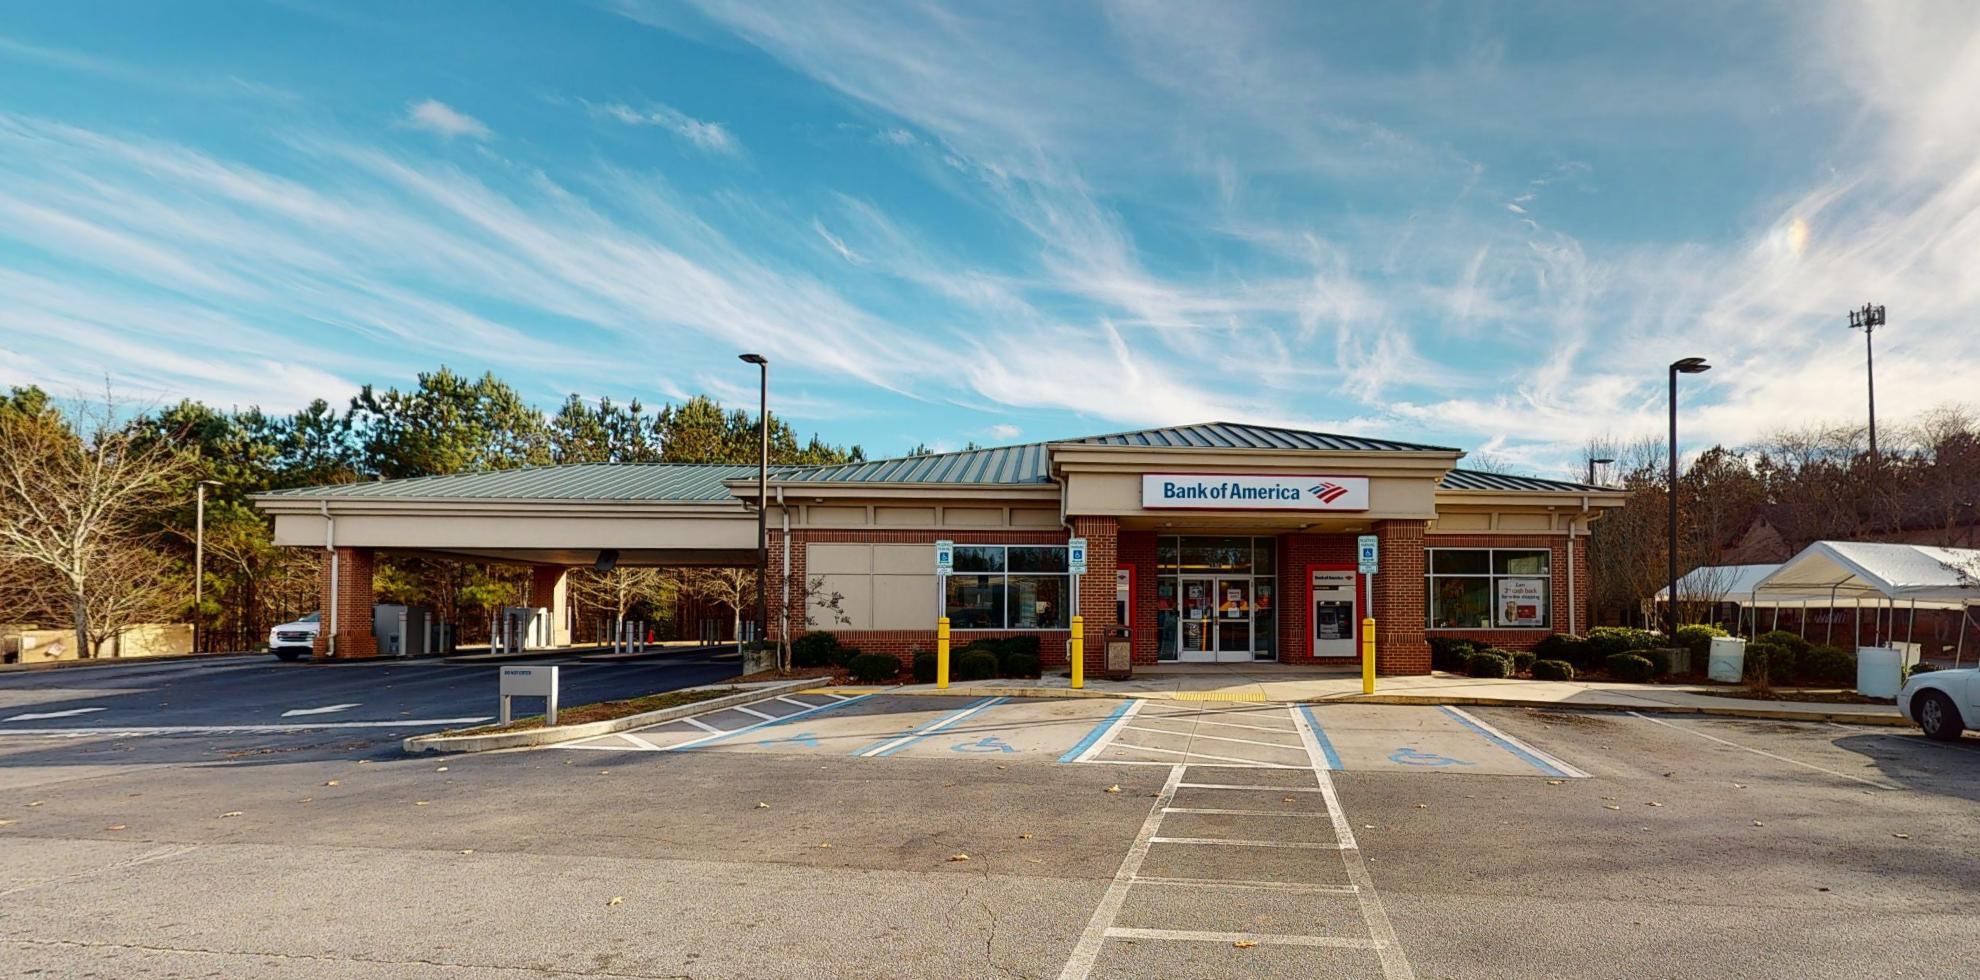 Bank of America financial center with drive-thru ATM   6976 Douglas Blvd, Douglasville, GA 30135